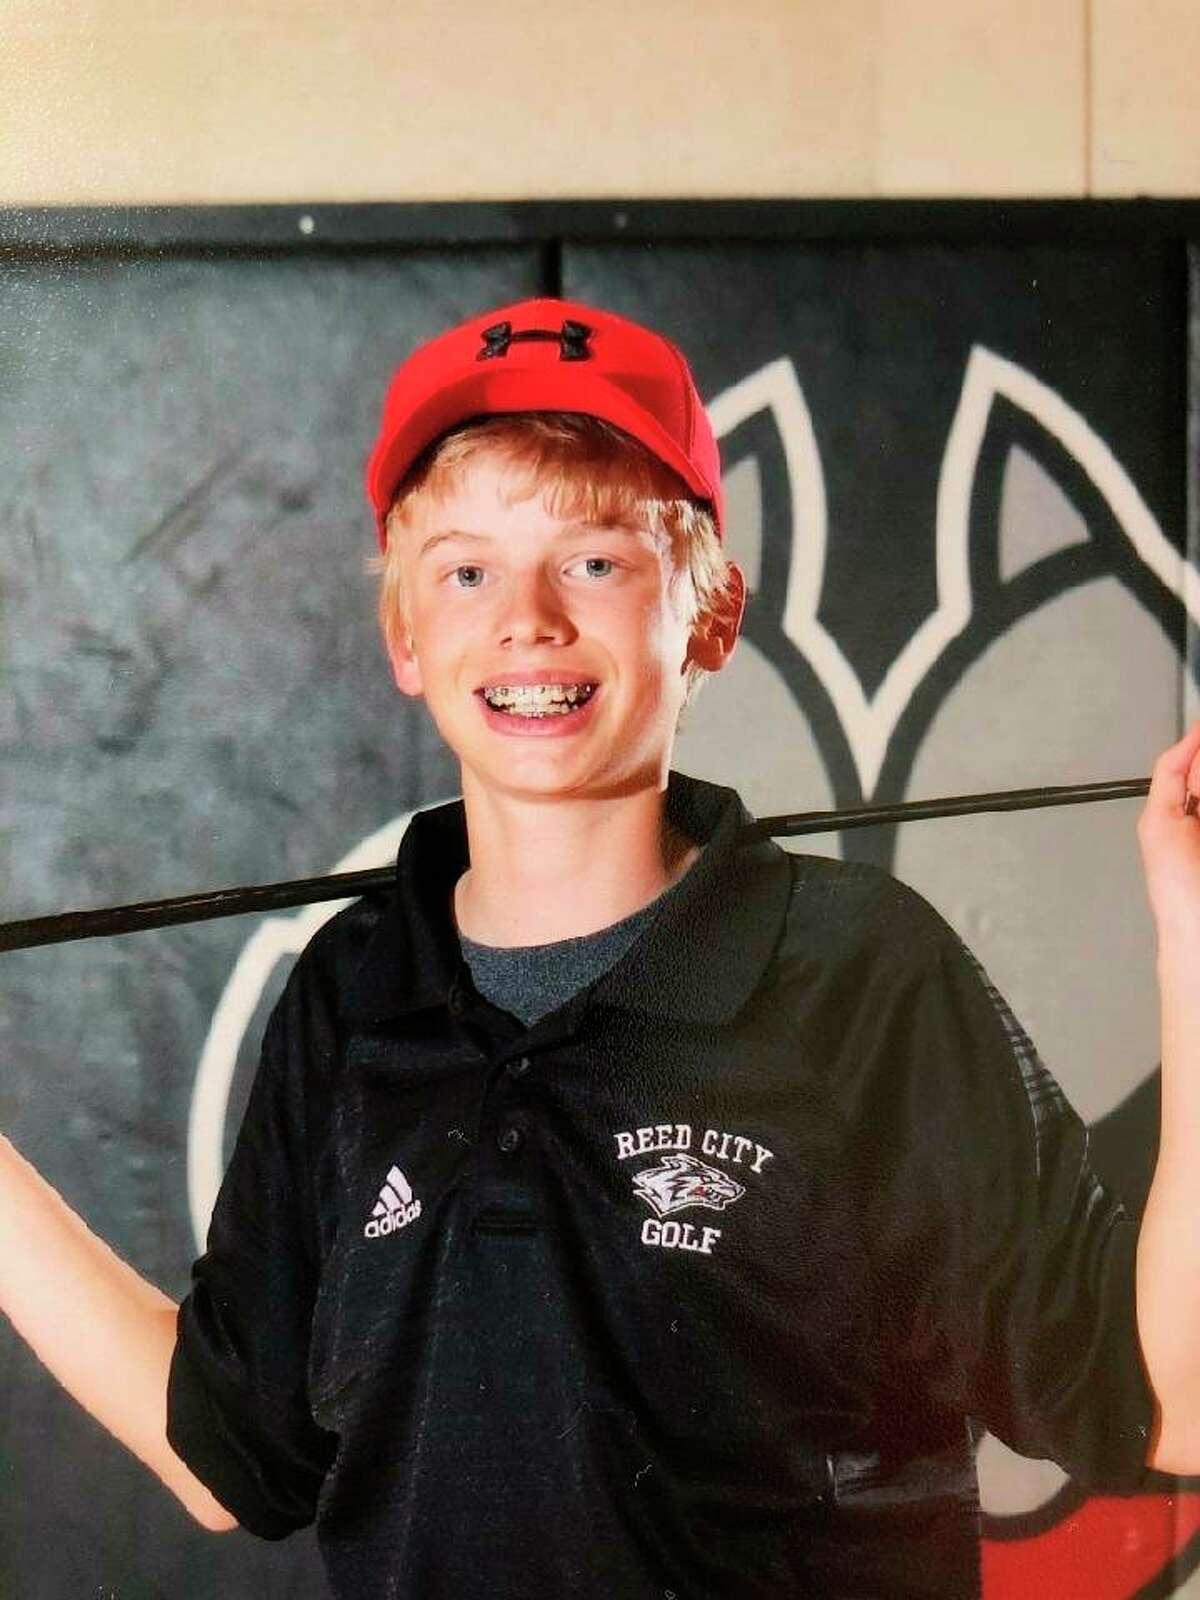 Fischer Morrison is among Reed City's top golfers. (Herald Review photo/John Raffel)